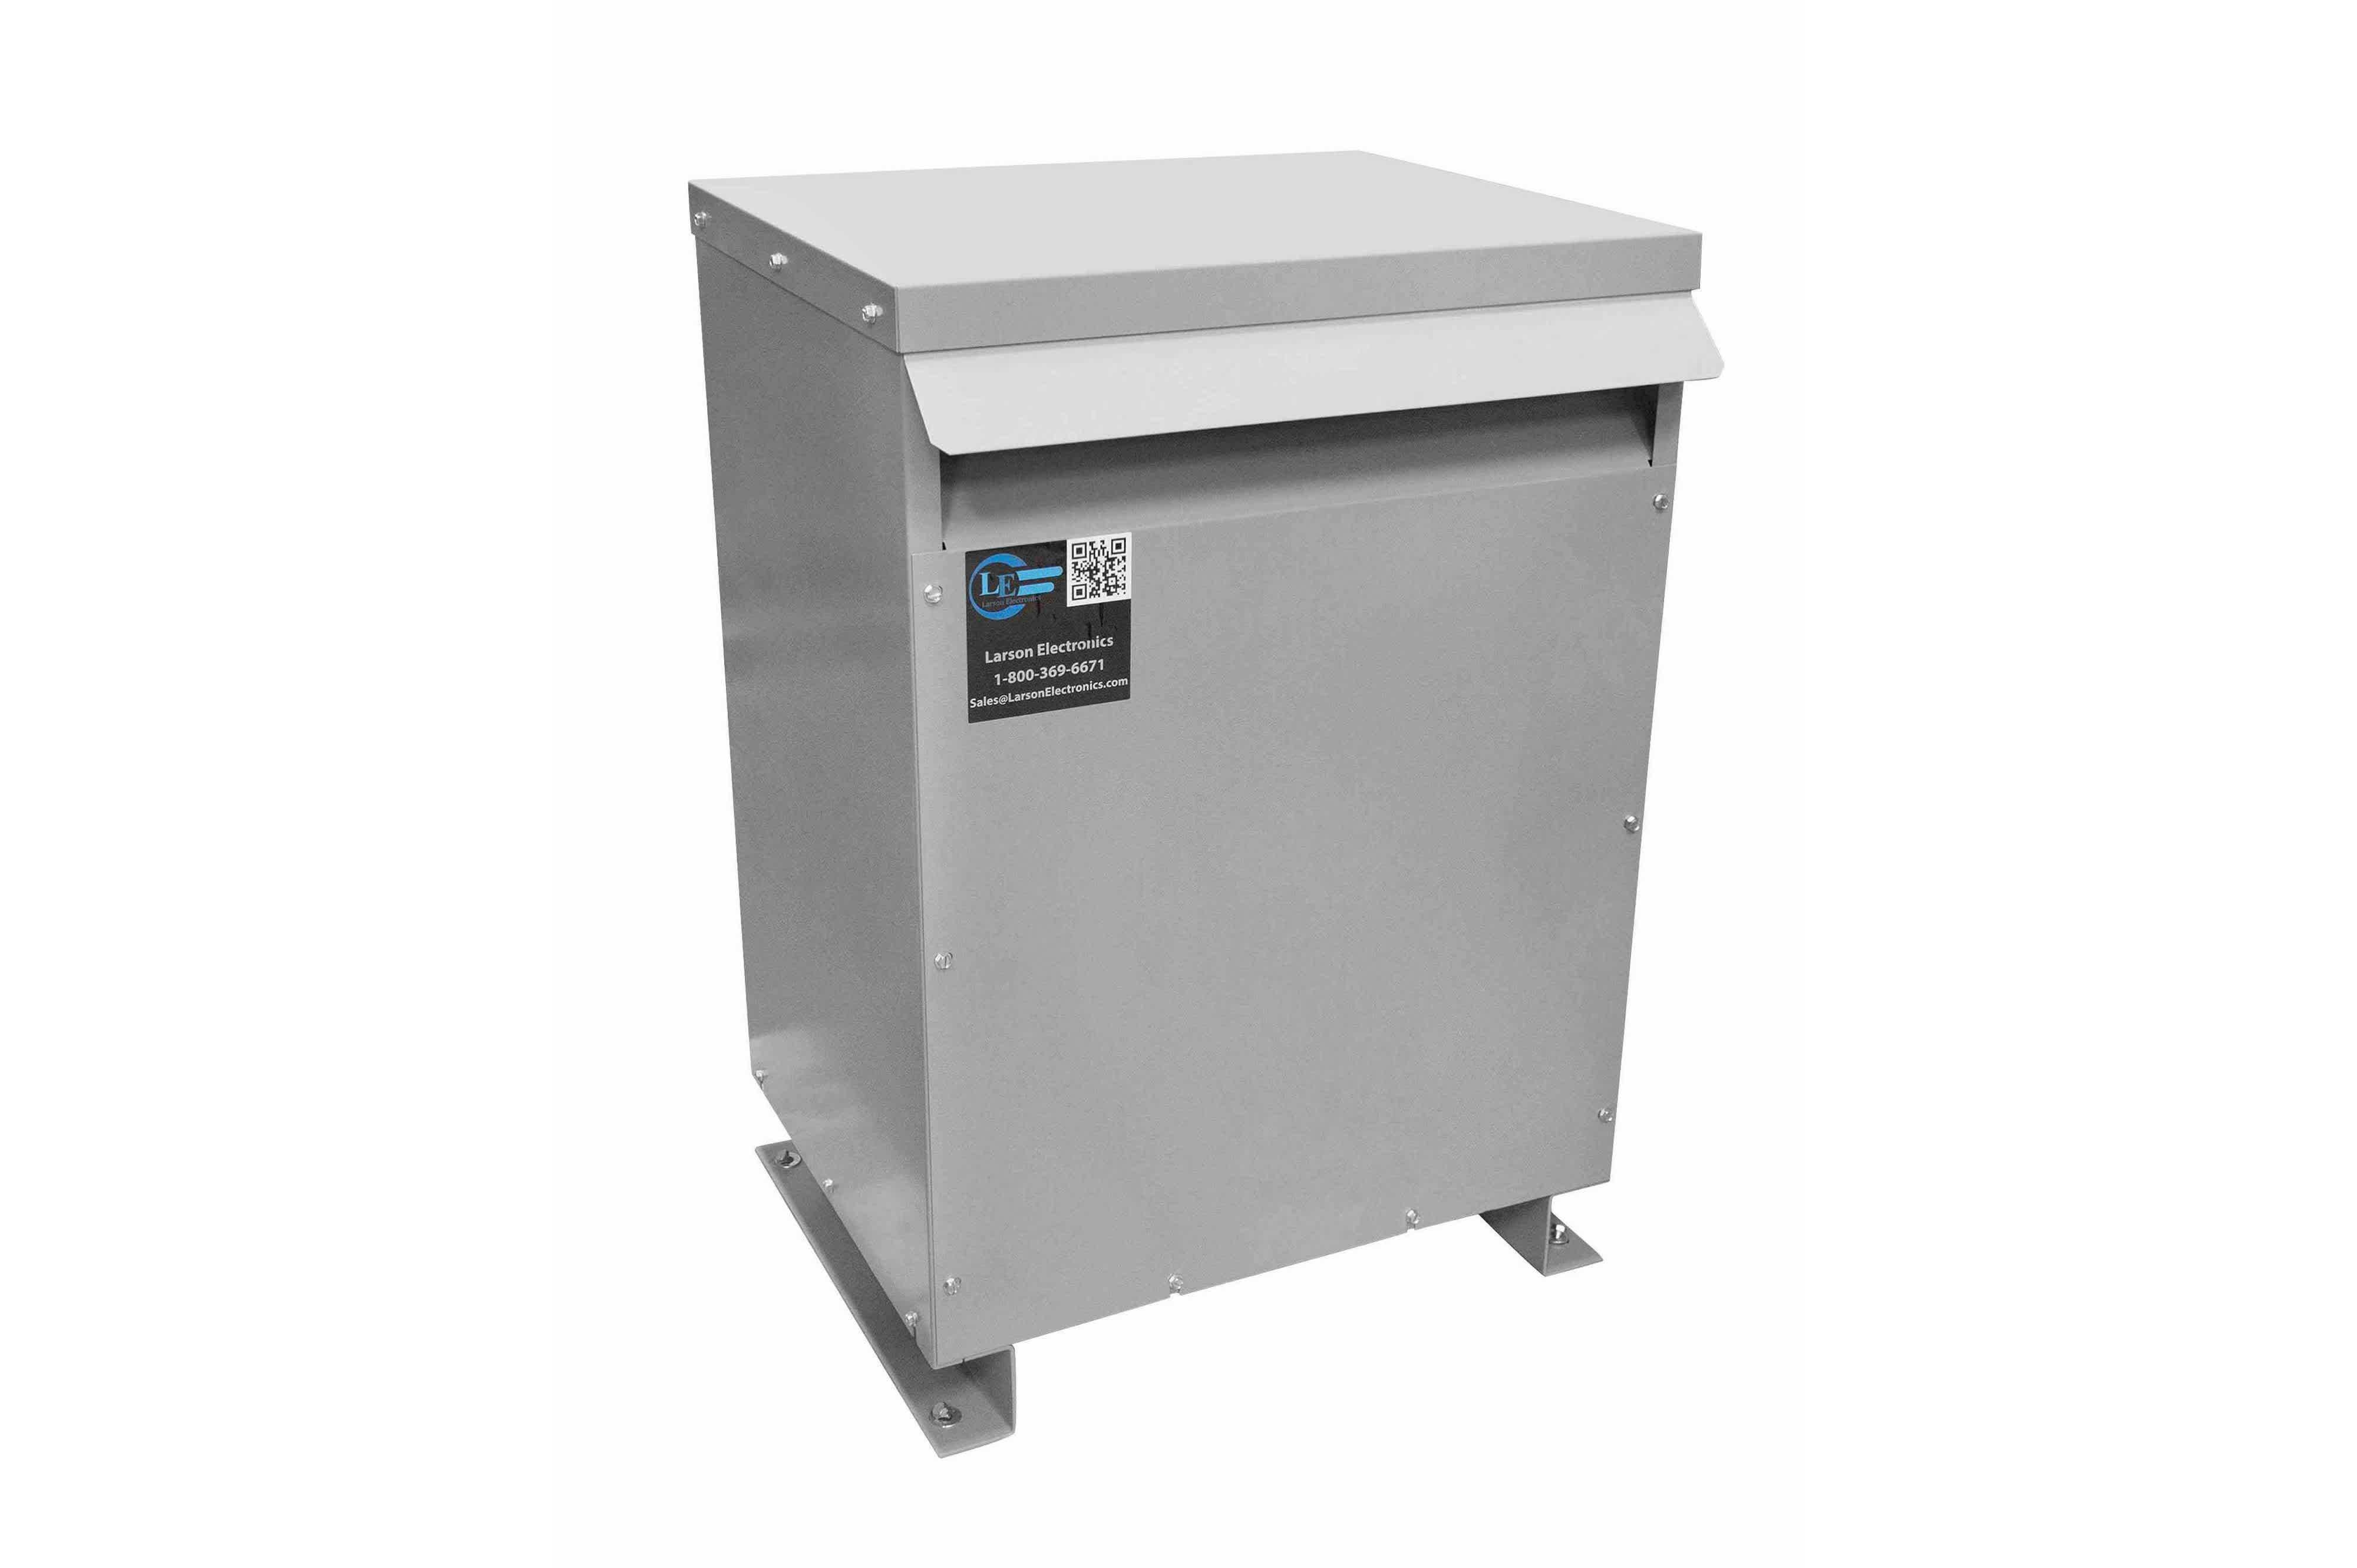 28 kVA 3PH Isolation Transformer, 380V Wye Primary, 208V Delta Secondary, N3R, Ventilated, 60 Hz